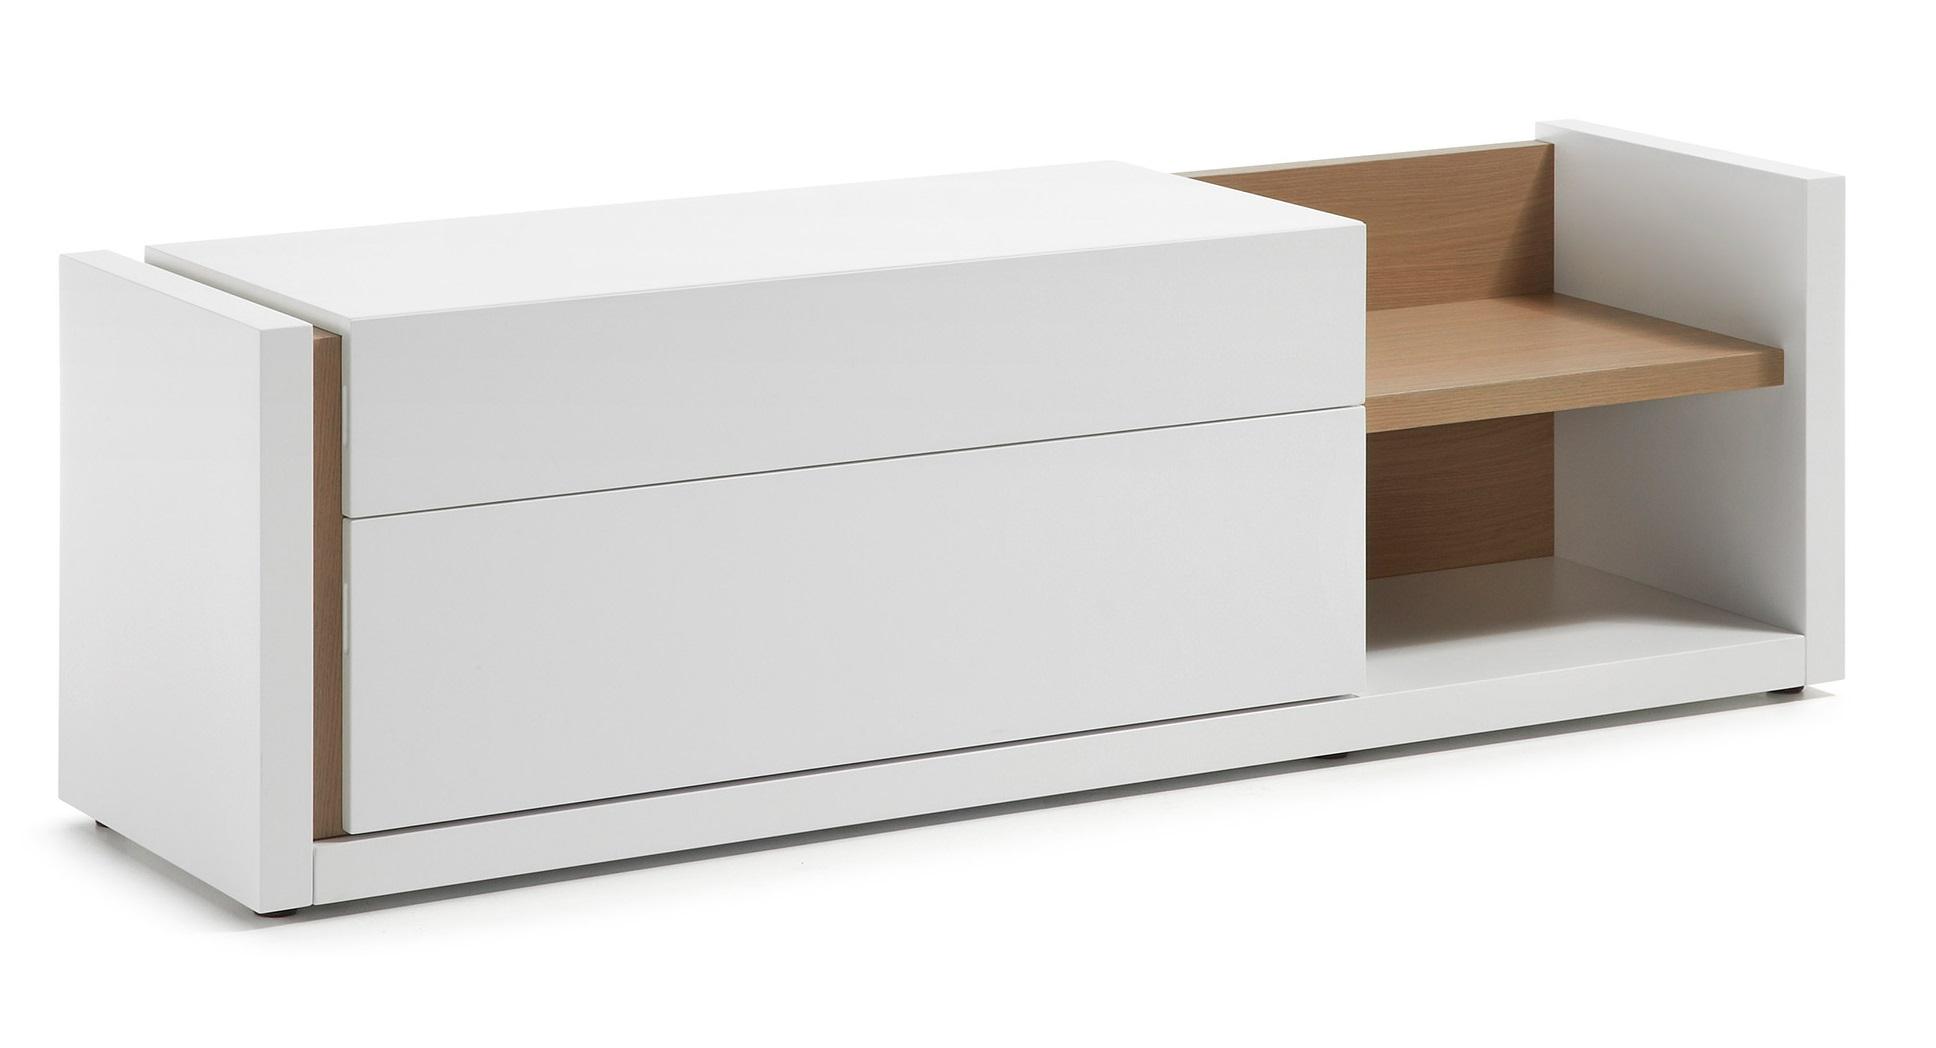 Muebles blanco mate 20170907082044 Mueble tv blanco brillo